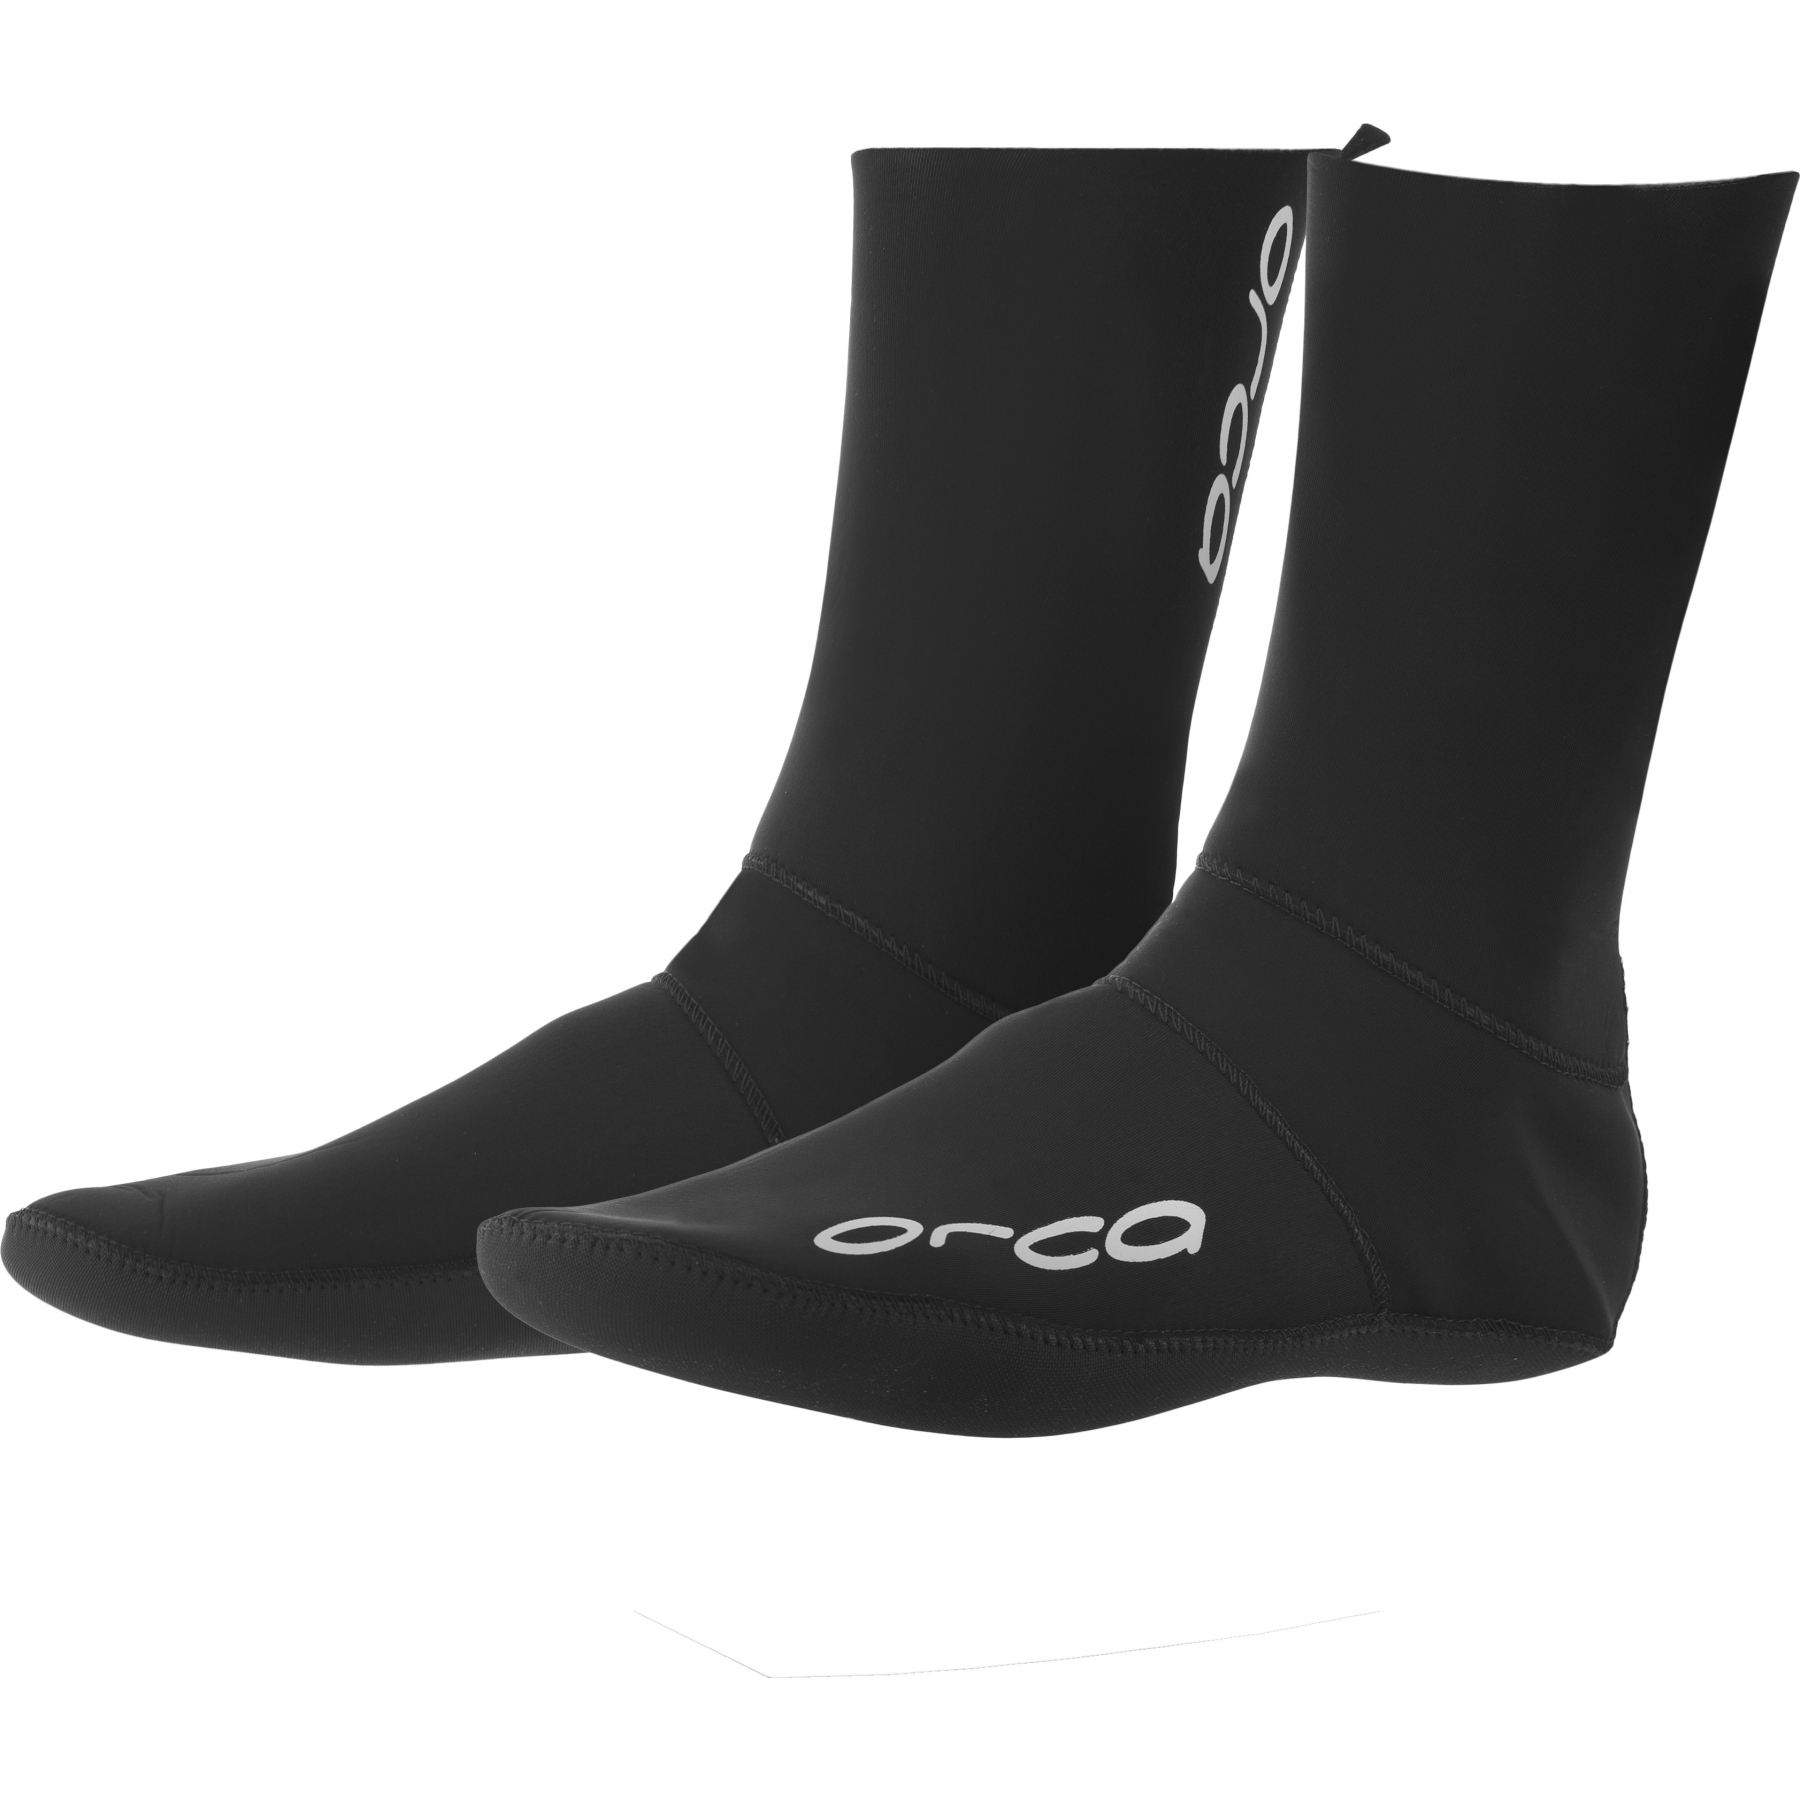 Foto de Orca Swim Socks - black